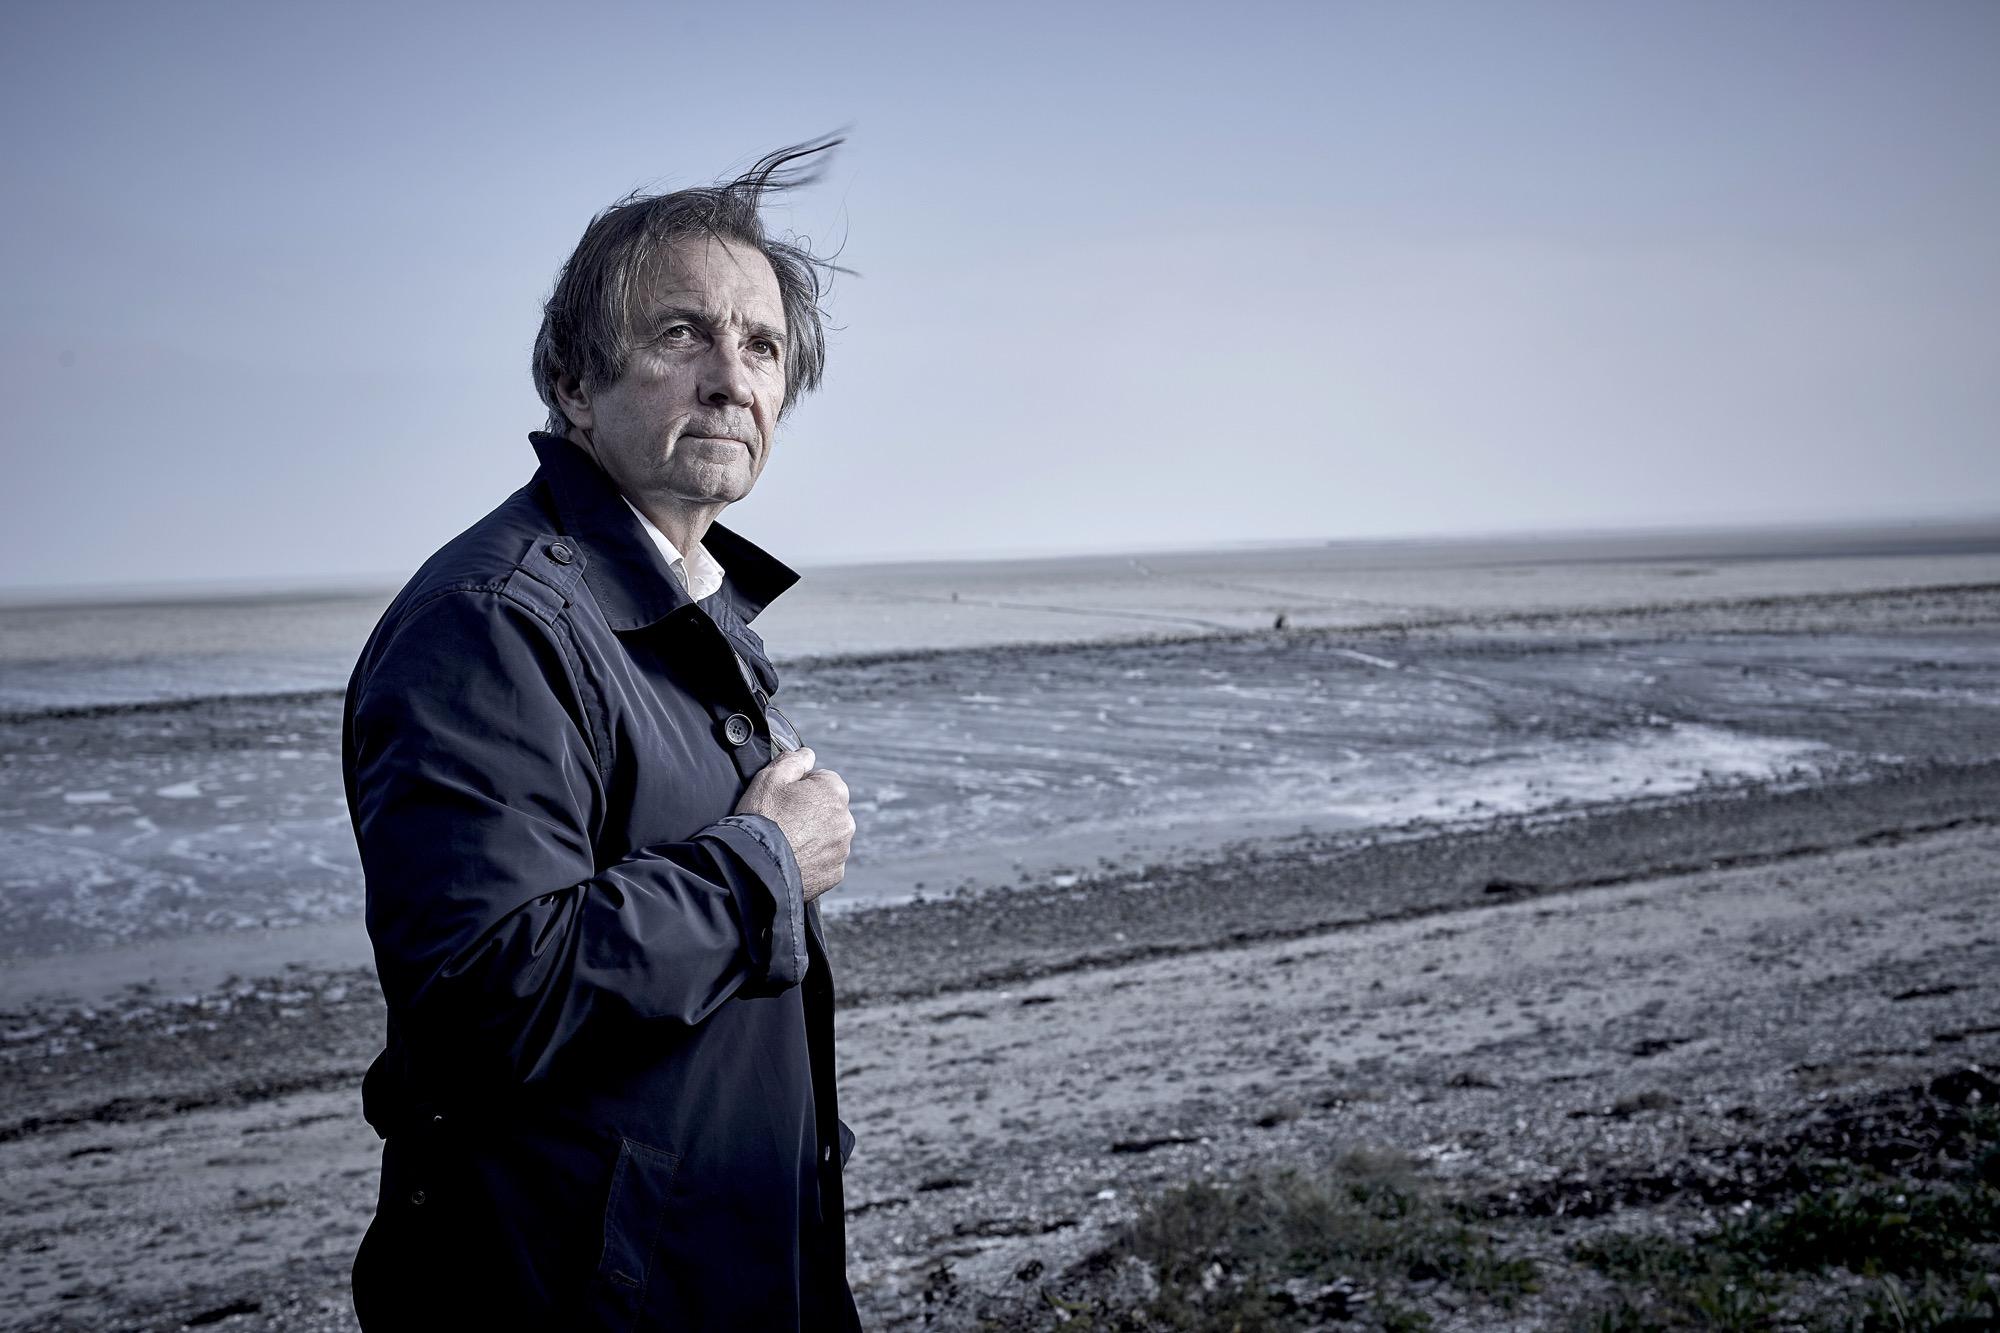 Olivier Roellinger © Emmanuel Pain